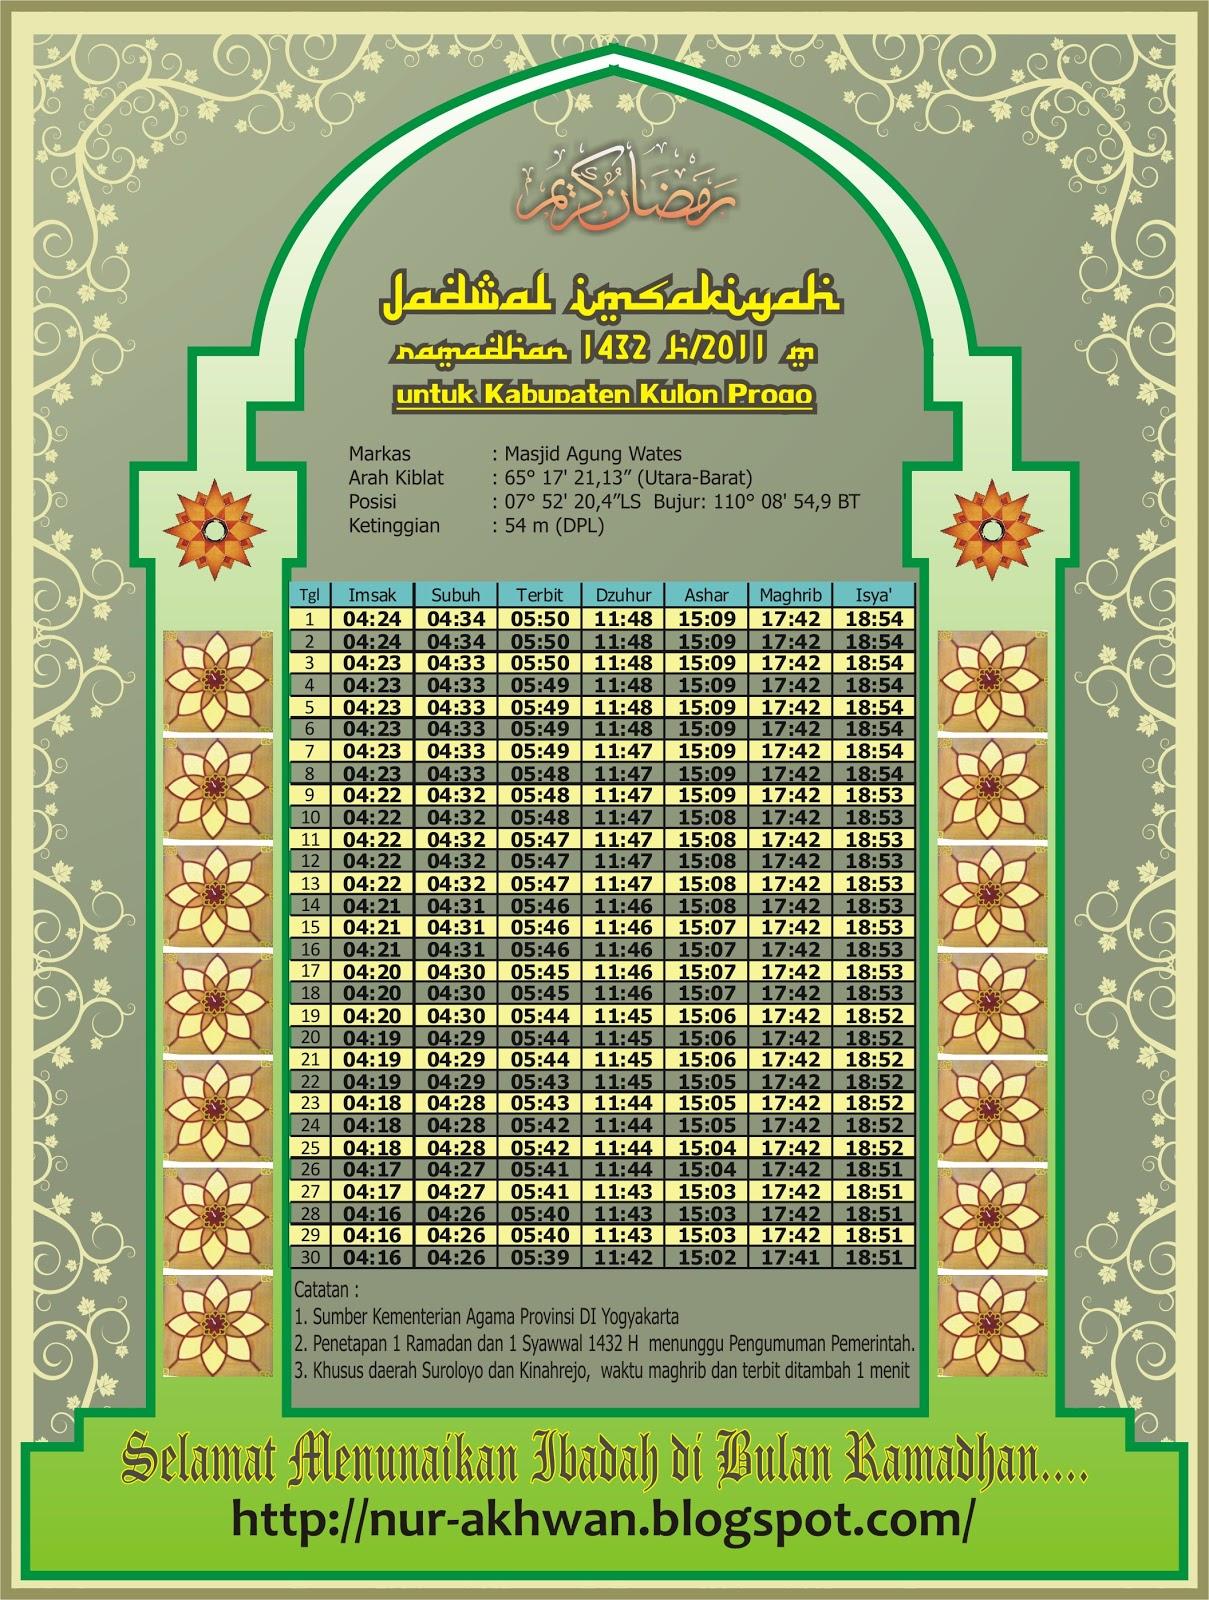 Jadwal Imsakiyah Ramadhan Cdr - Nelpon n